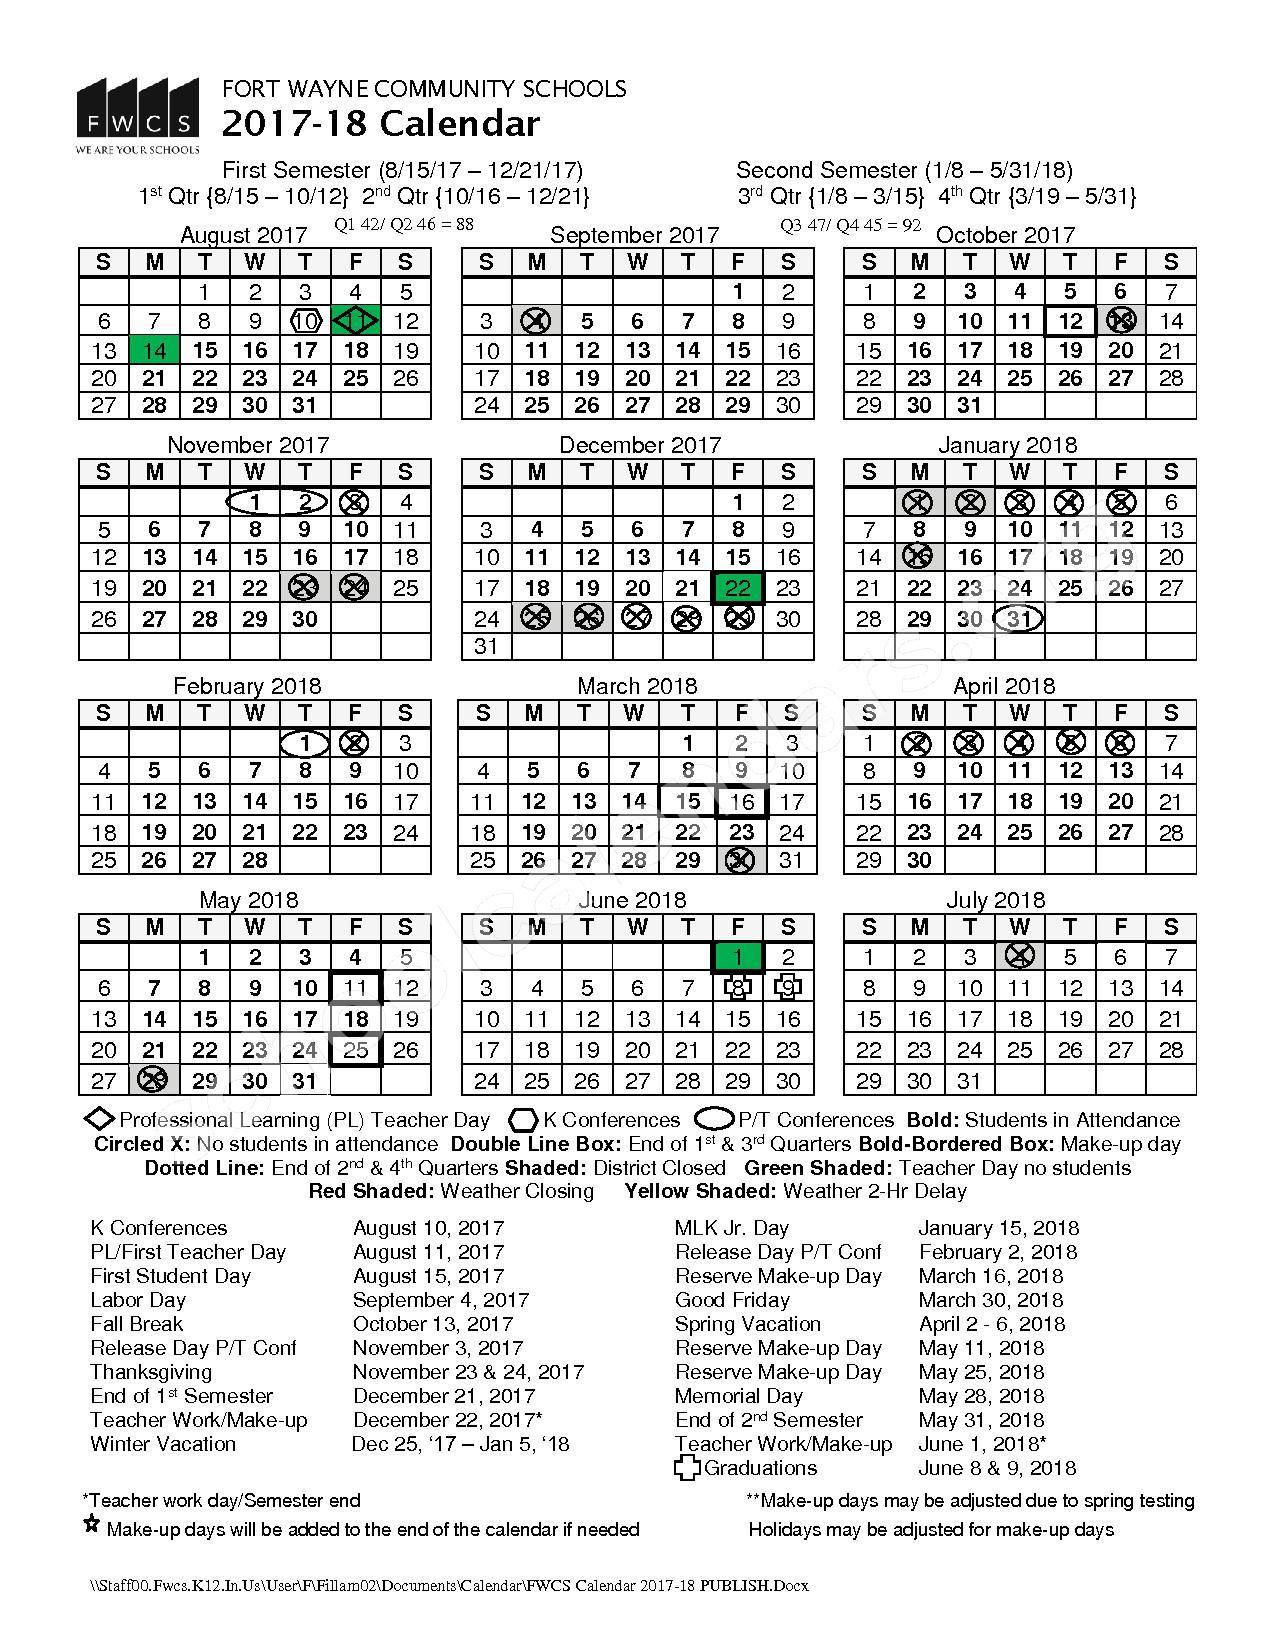 2017 - 2018 FWCS Calendar – Fort Wayne Community Schools – page 1